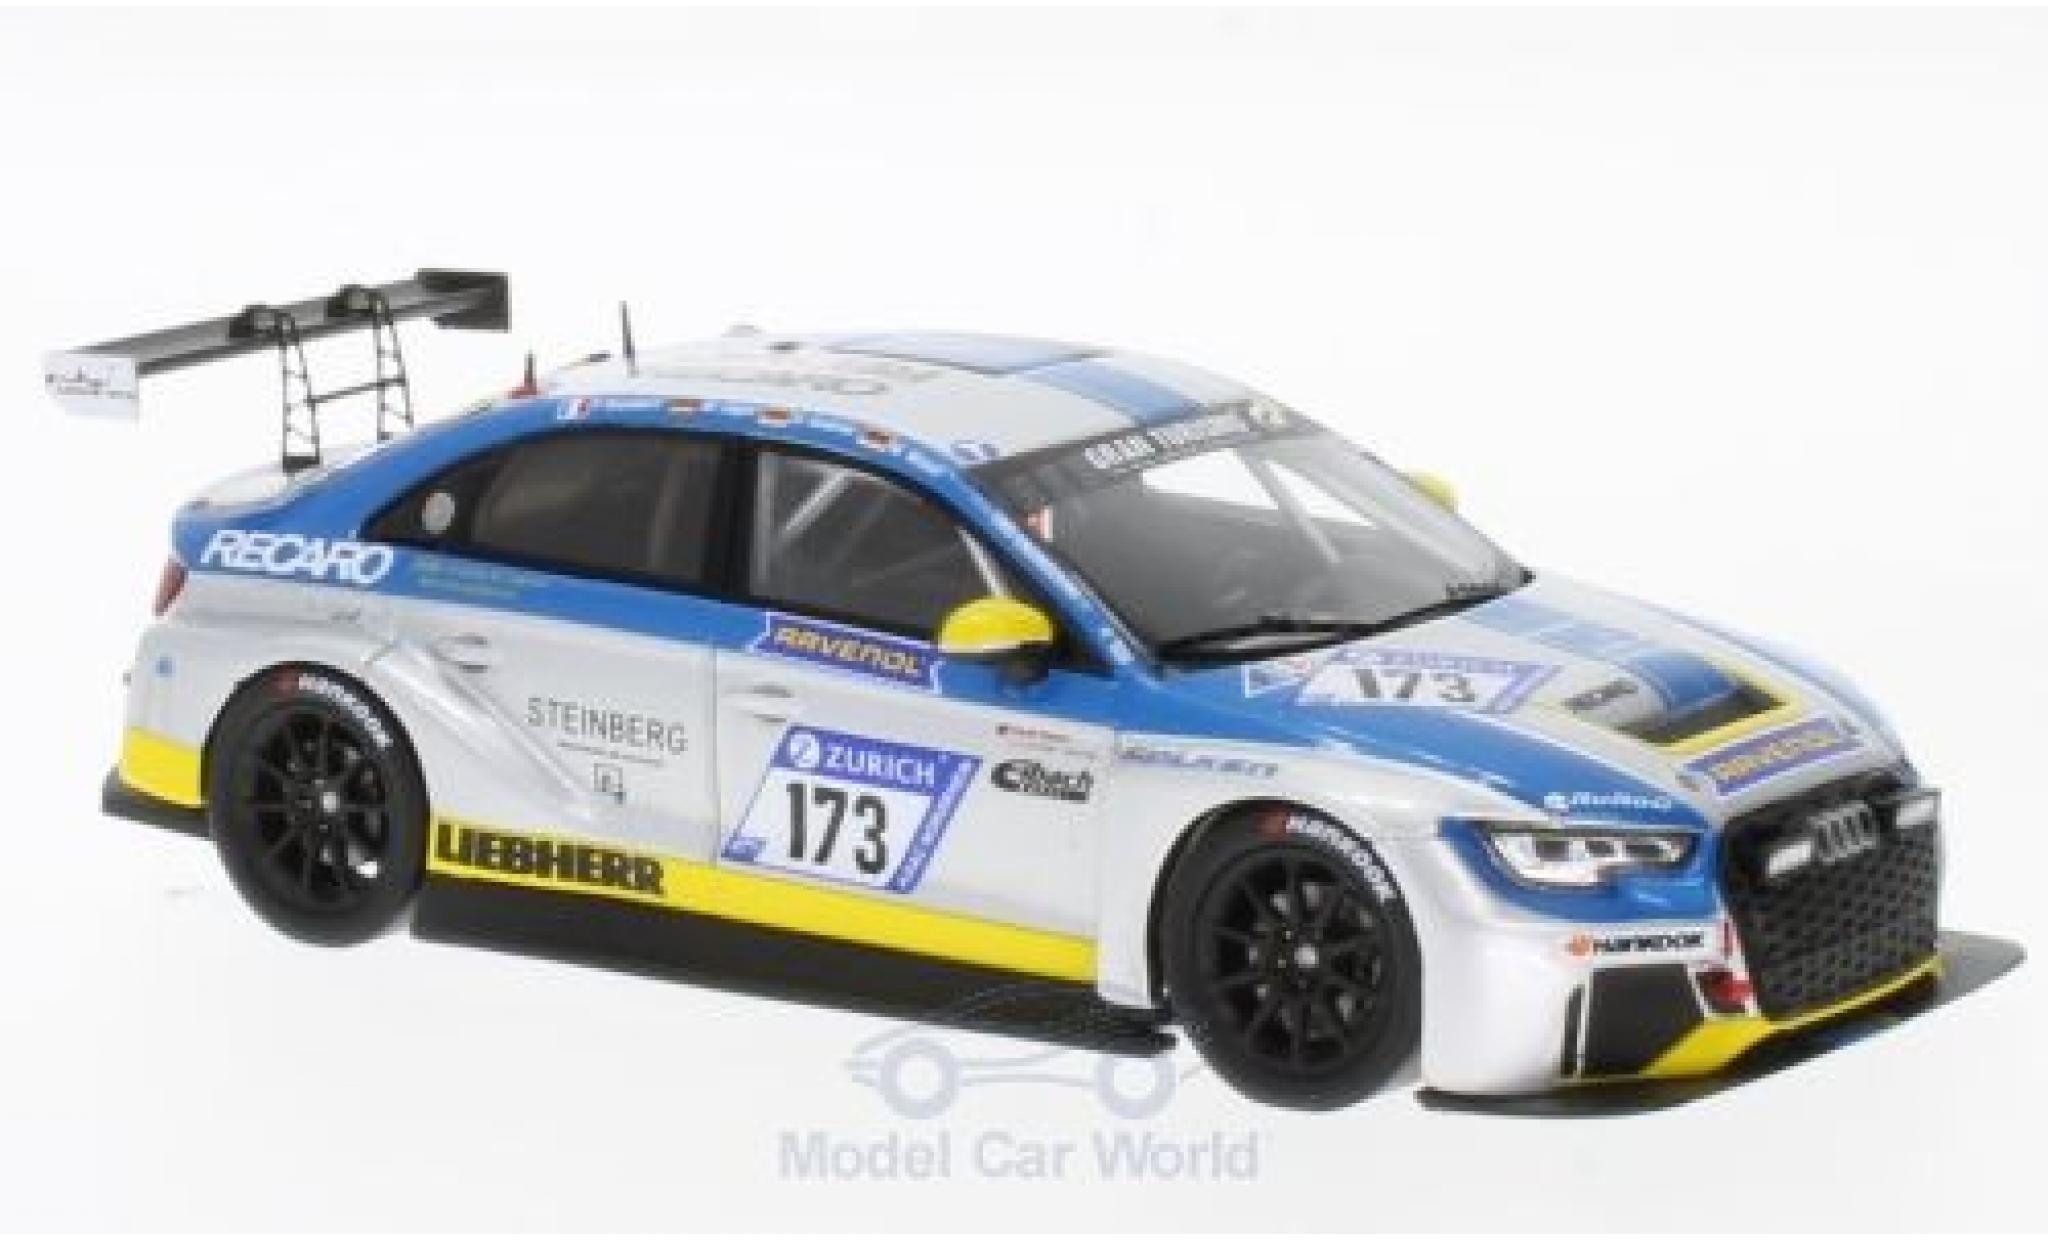 Audi RS3 1/43 Spark LMS DSG No.173 LMS Engineering 24h Nürburgring 2017 U.Andree/M.Jäger/M.Wasel/P.Humbert